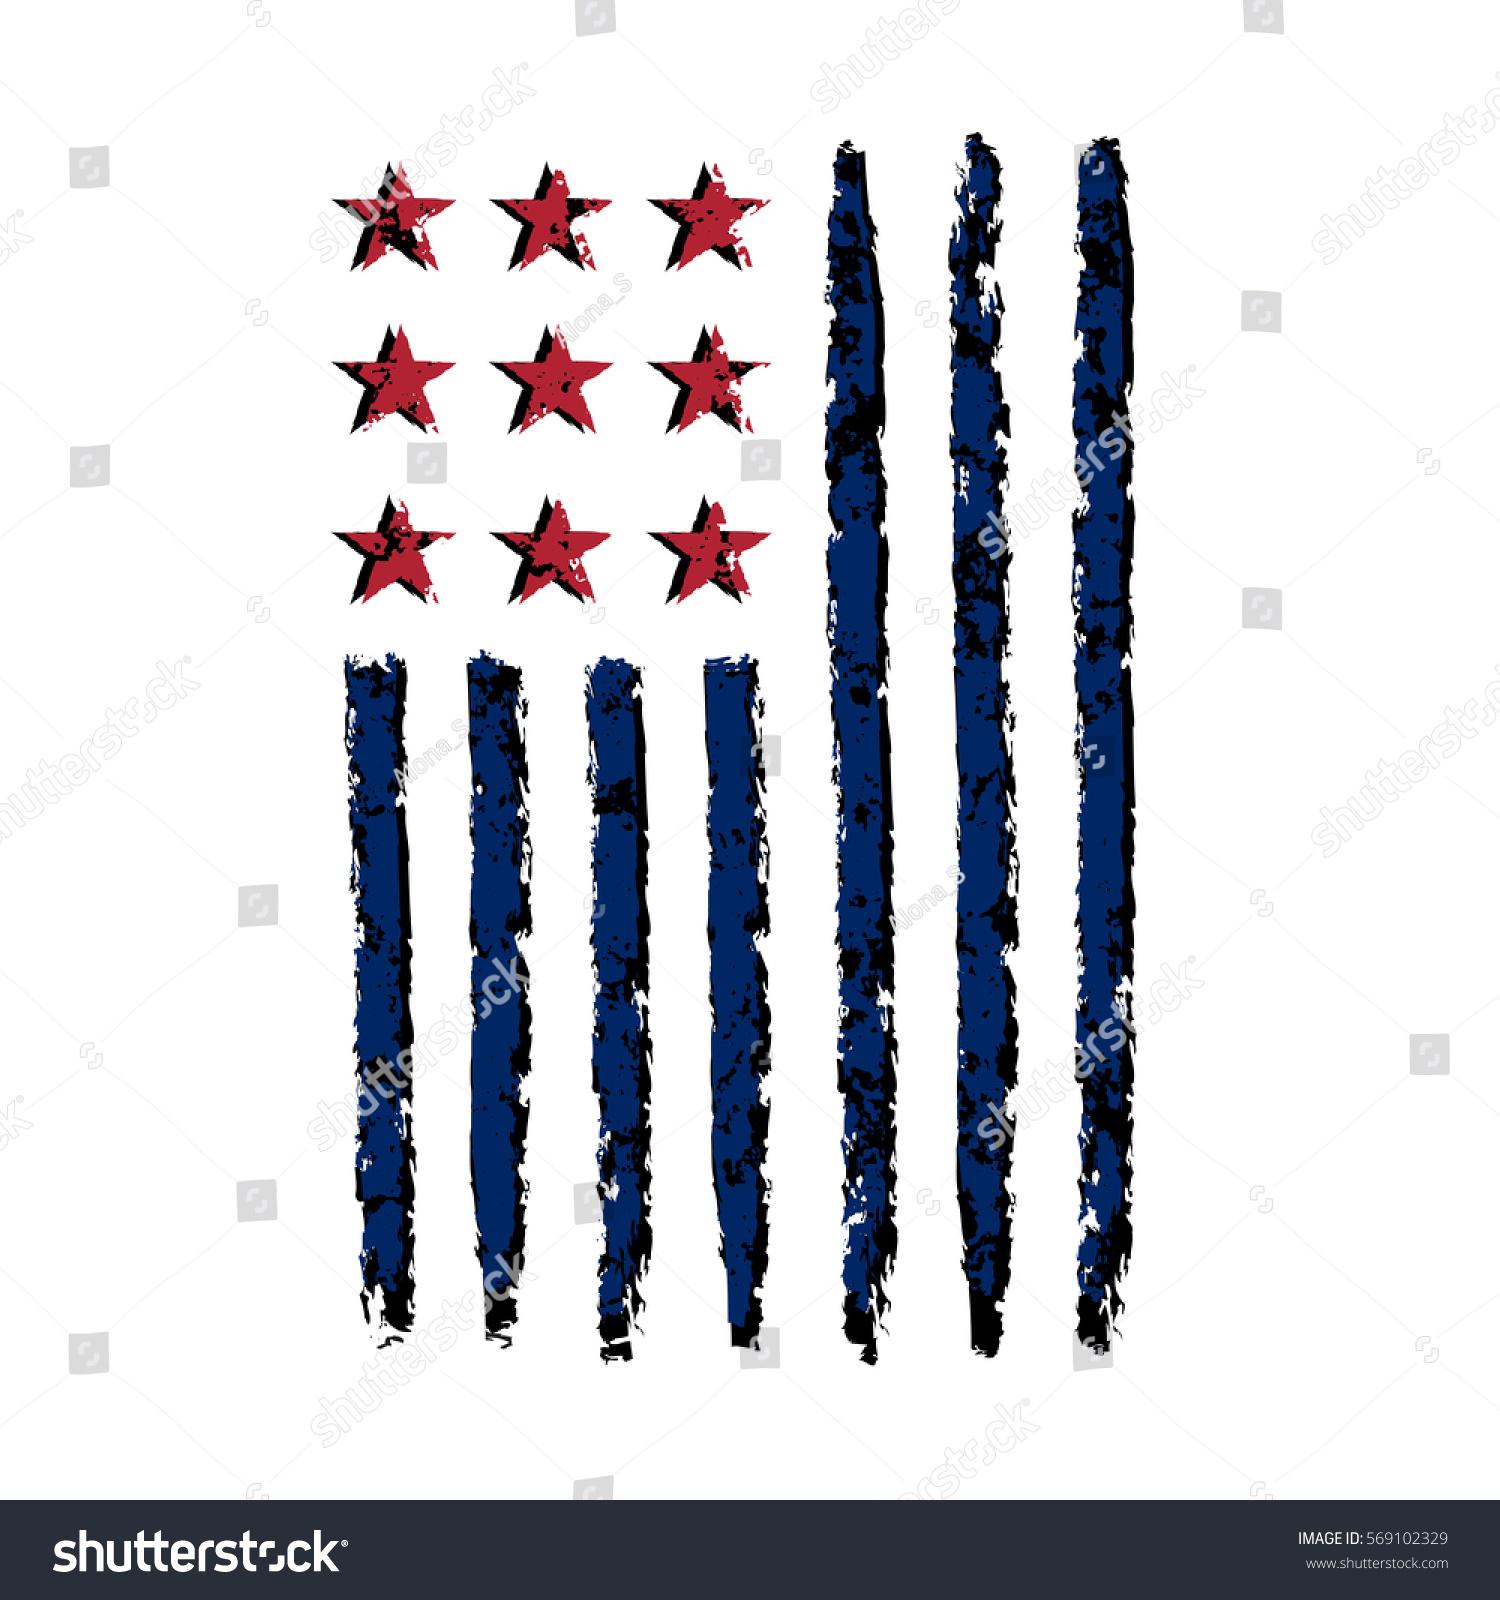 American flag grunge symbol 4th july stock illustration 569102329 american flag grunge symbol for 4th july independence day celebration patriotic typography graphics biocorpaavc